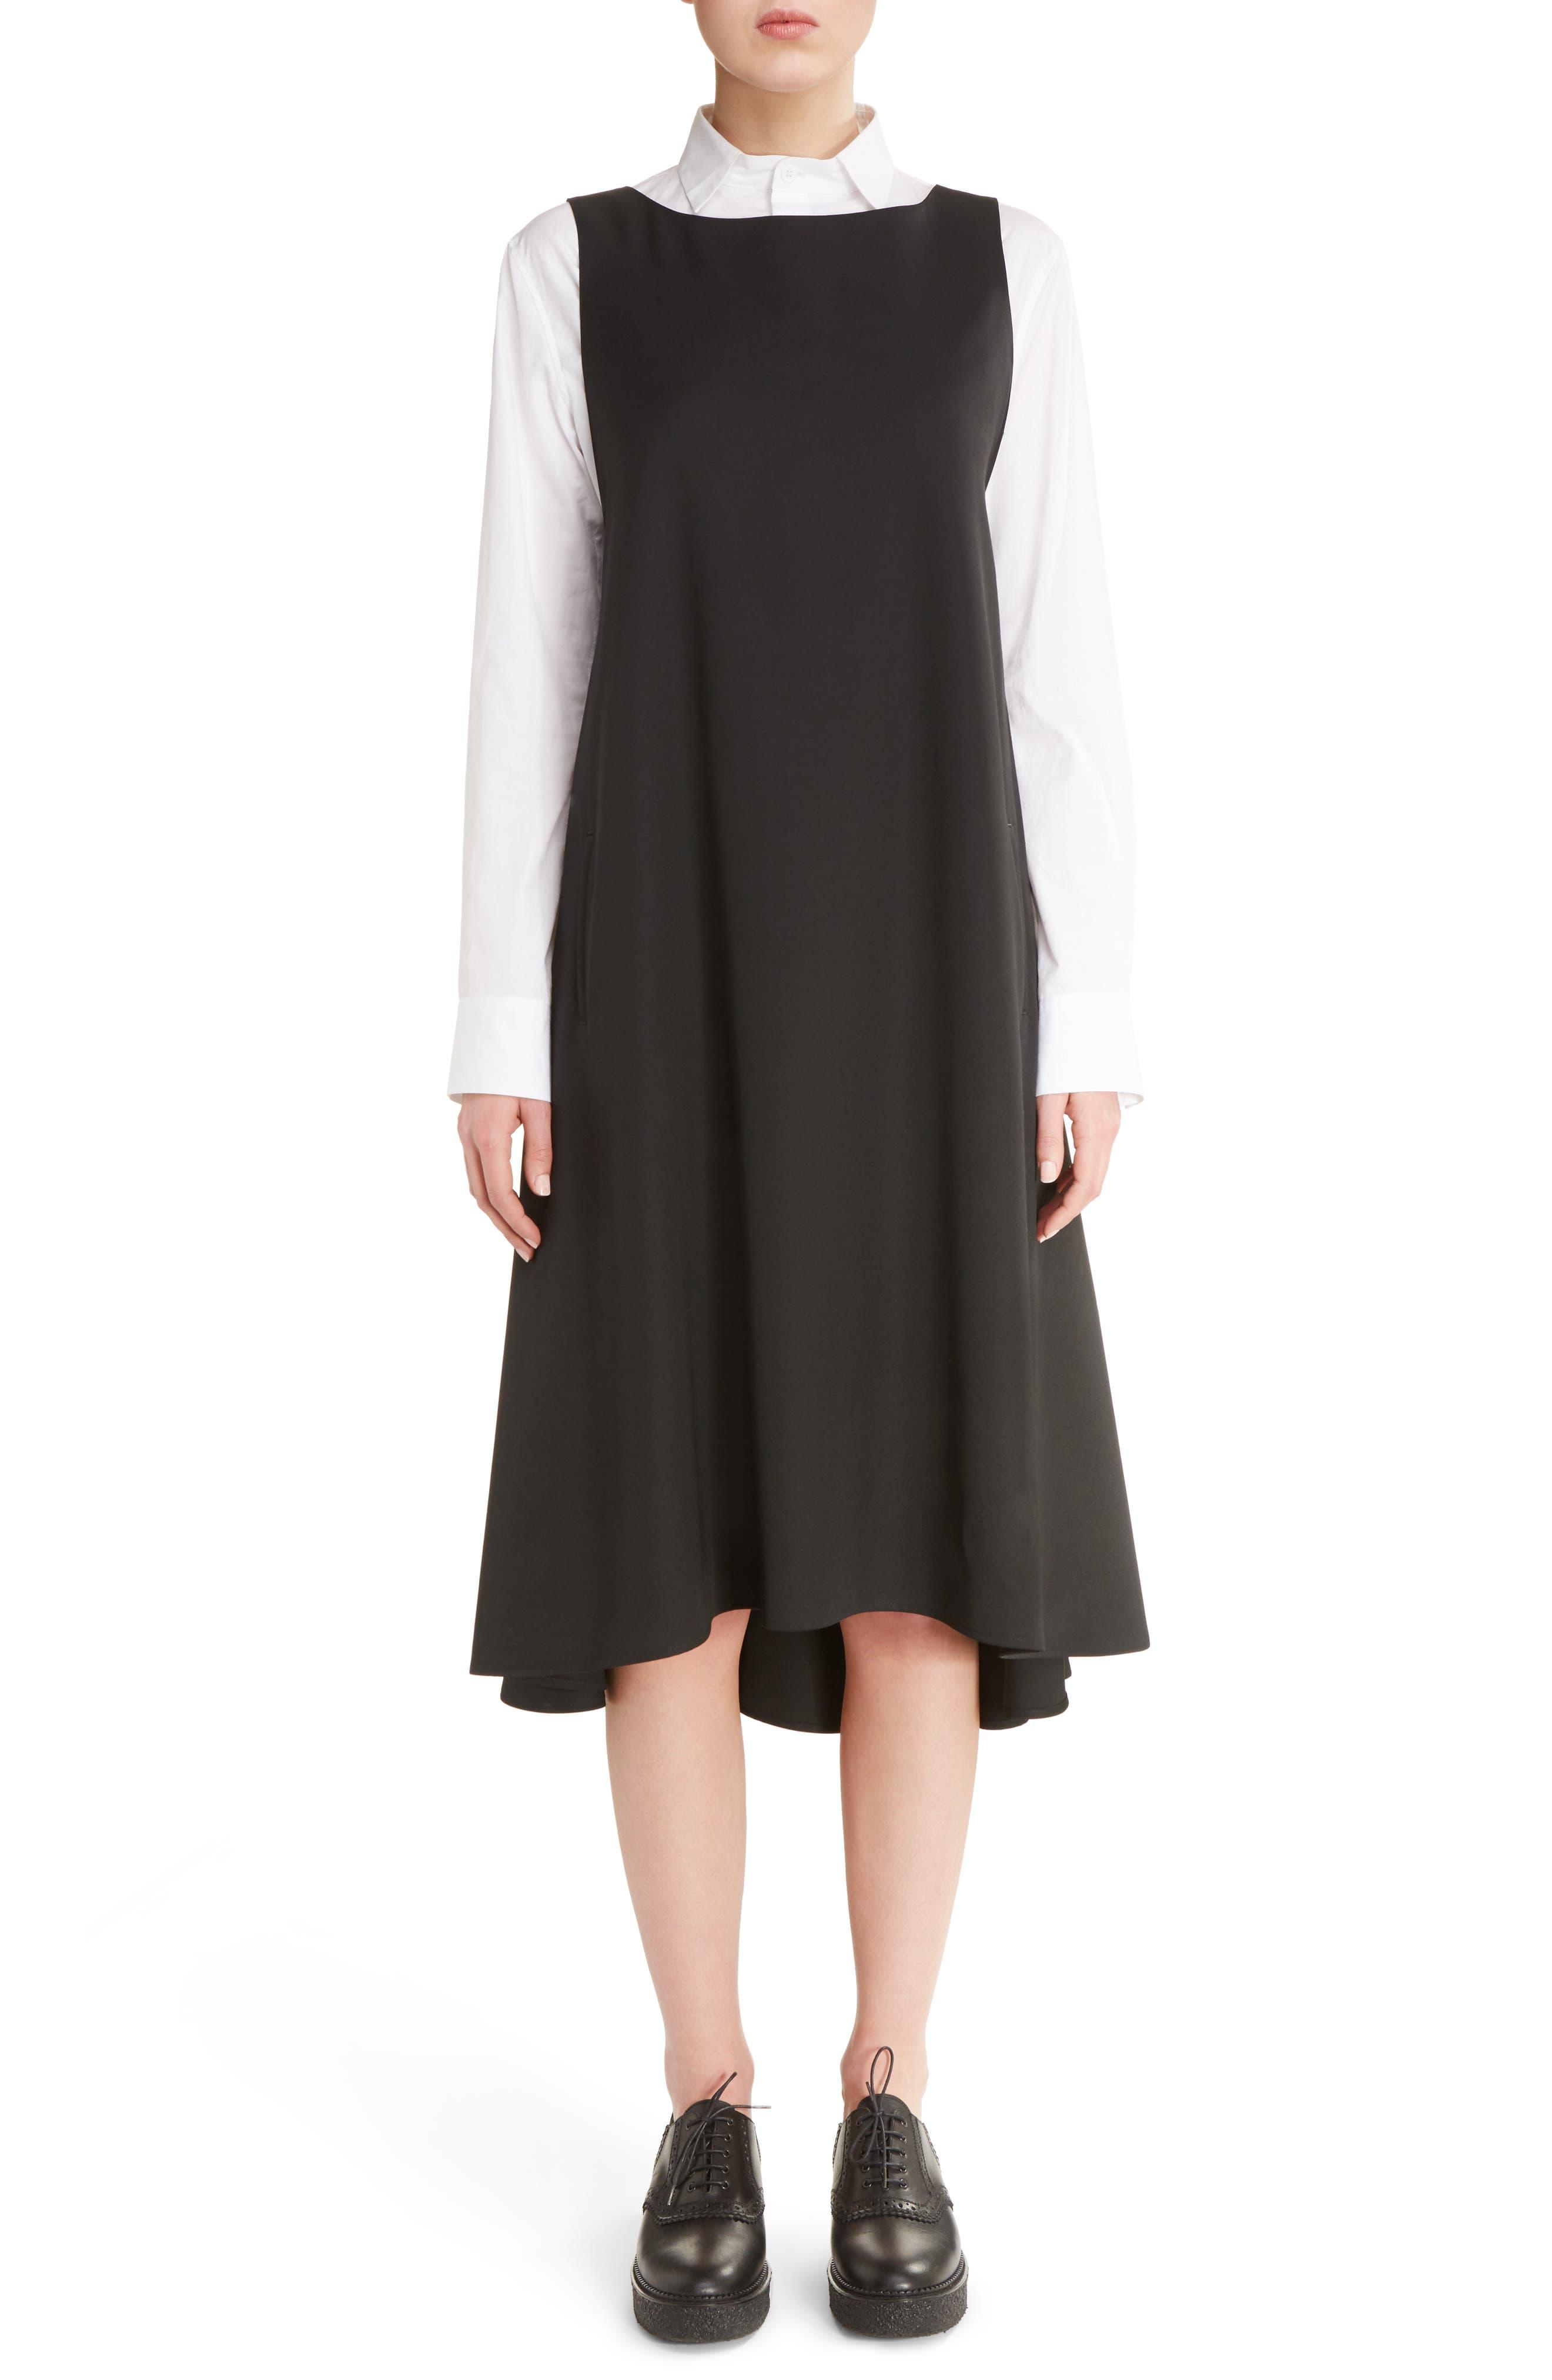 Alternate Image 1 Selected - Y's by Yohji Yamamoto V-Back Sleeveless Wool Dress